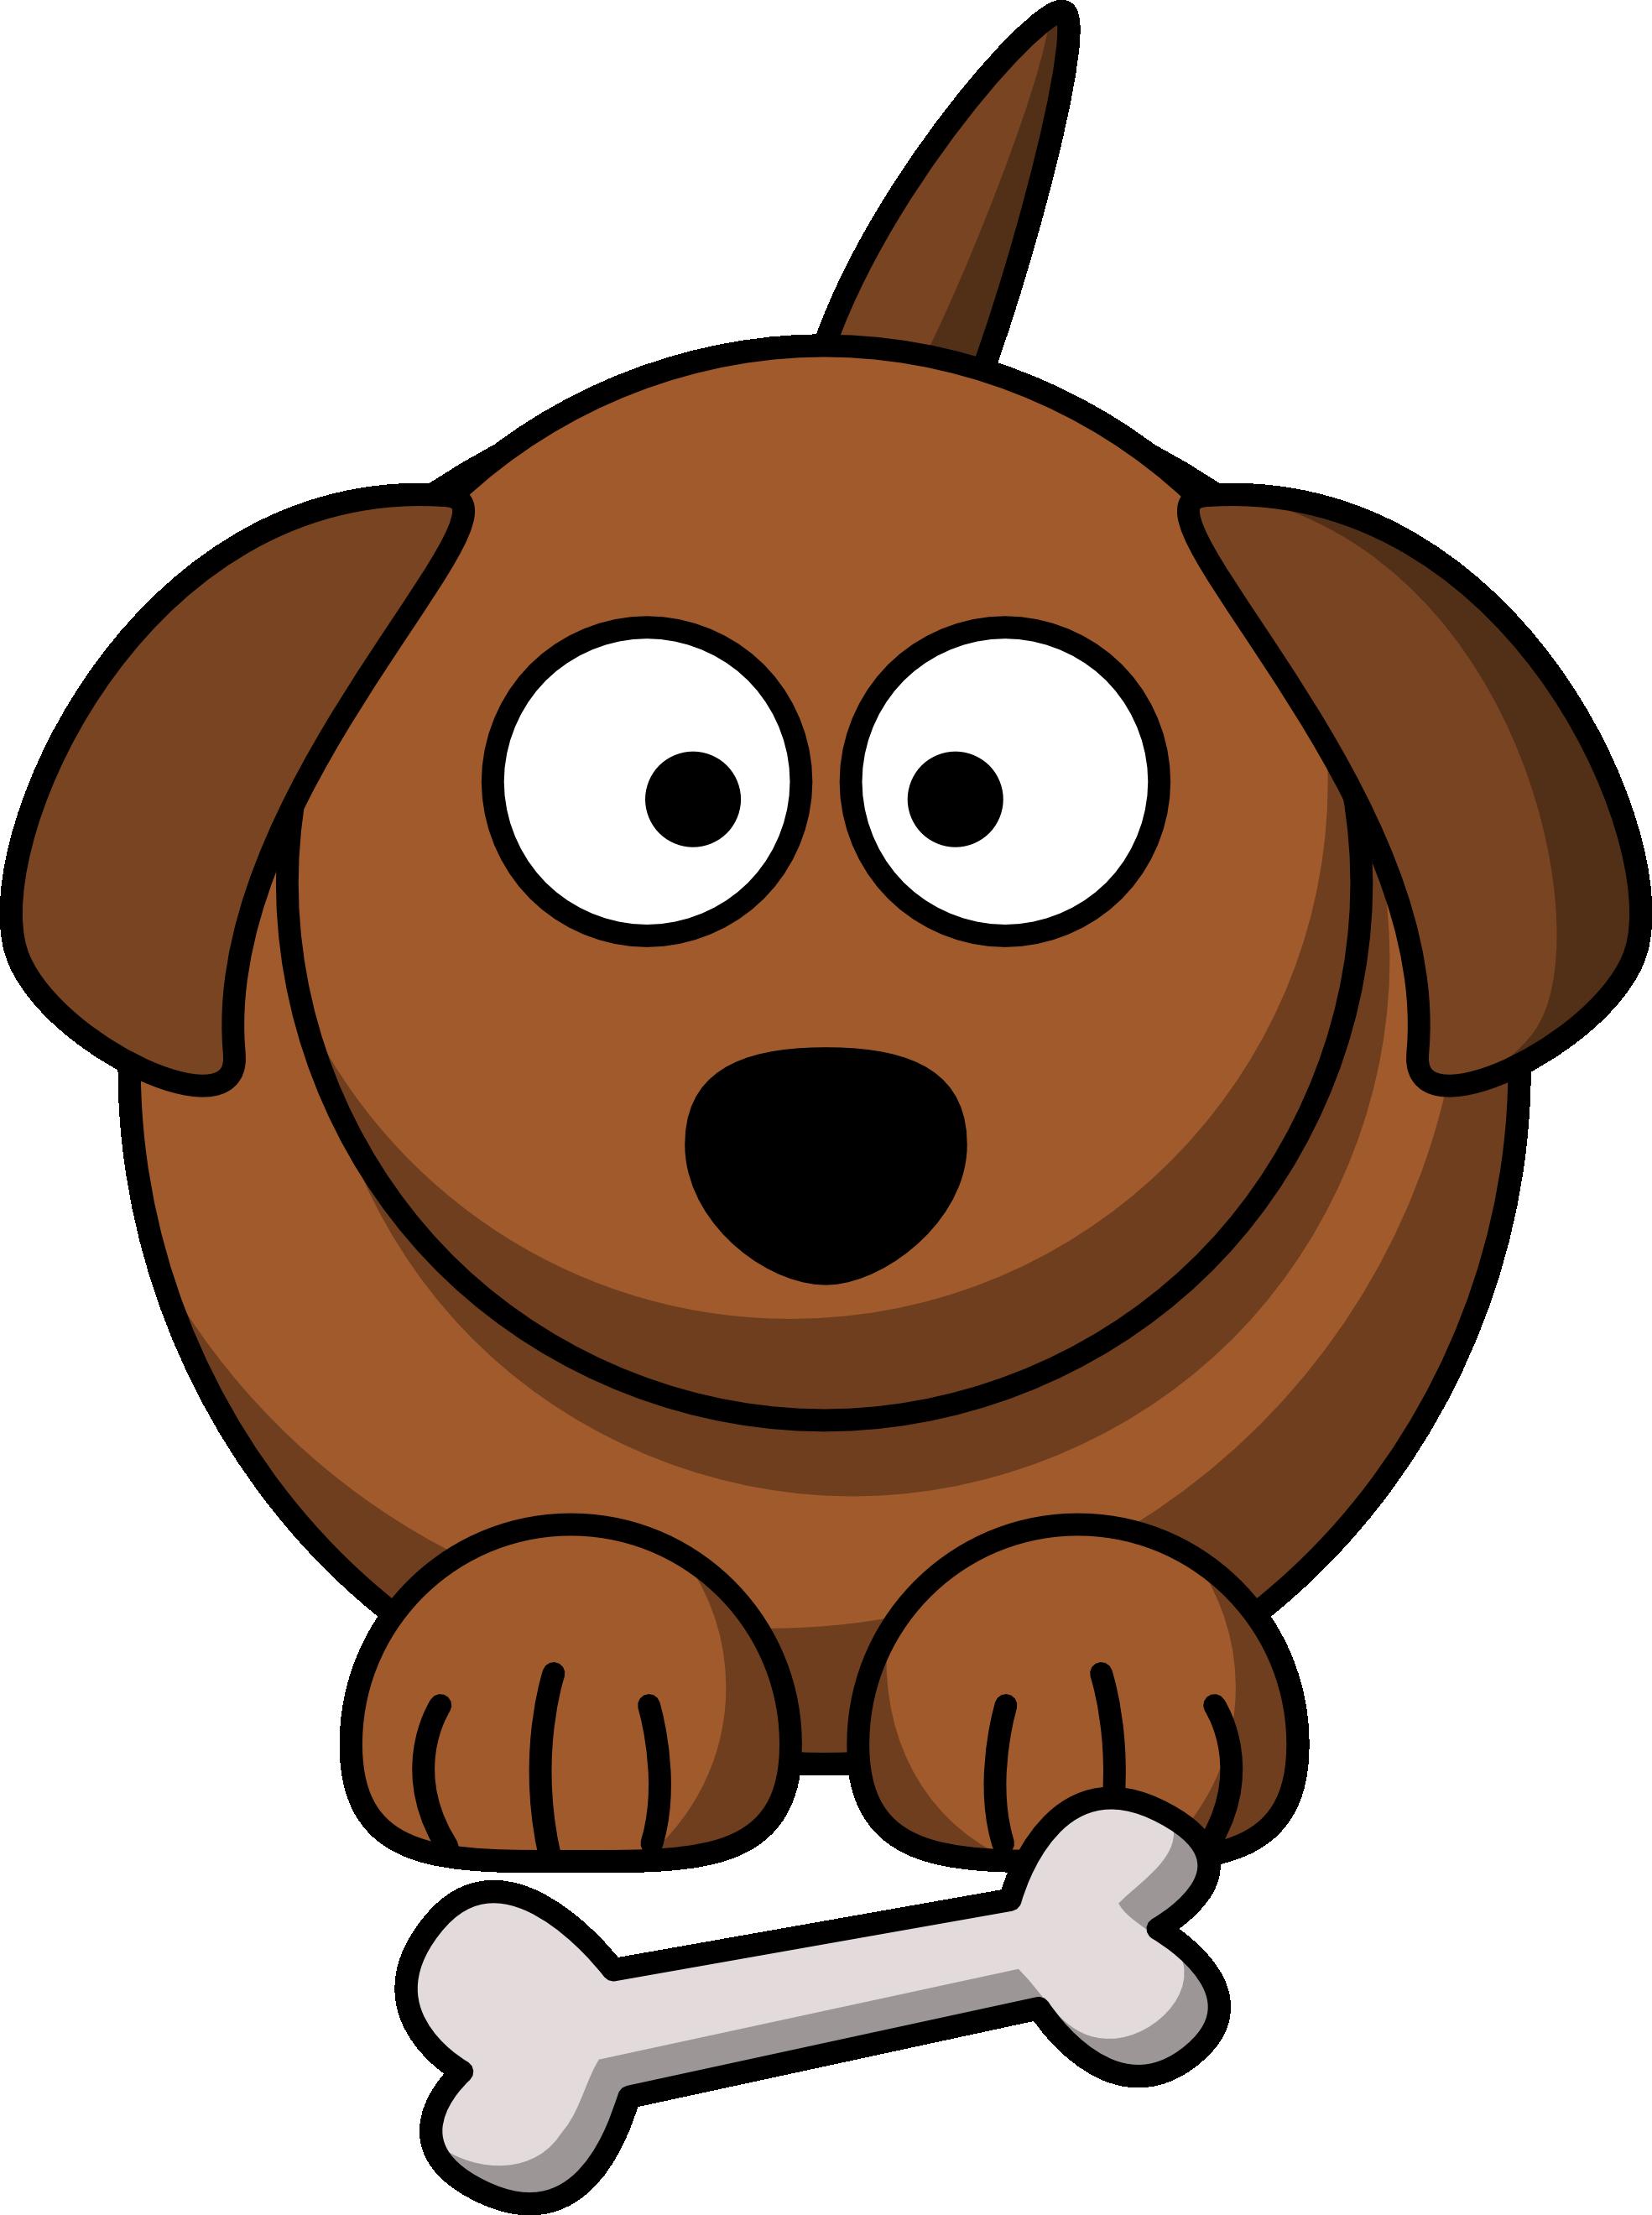 Animal PNG